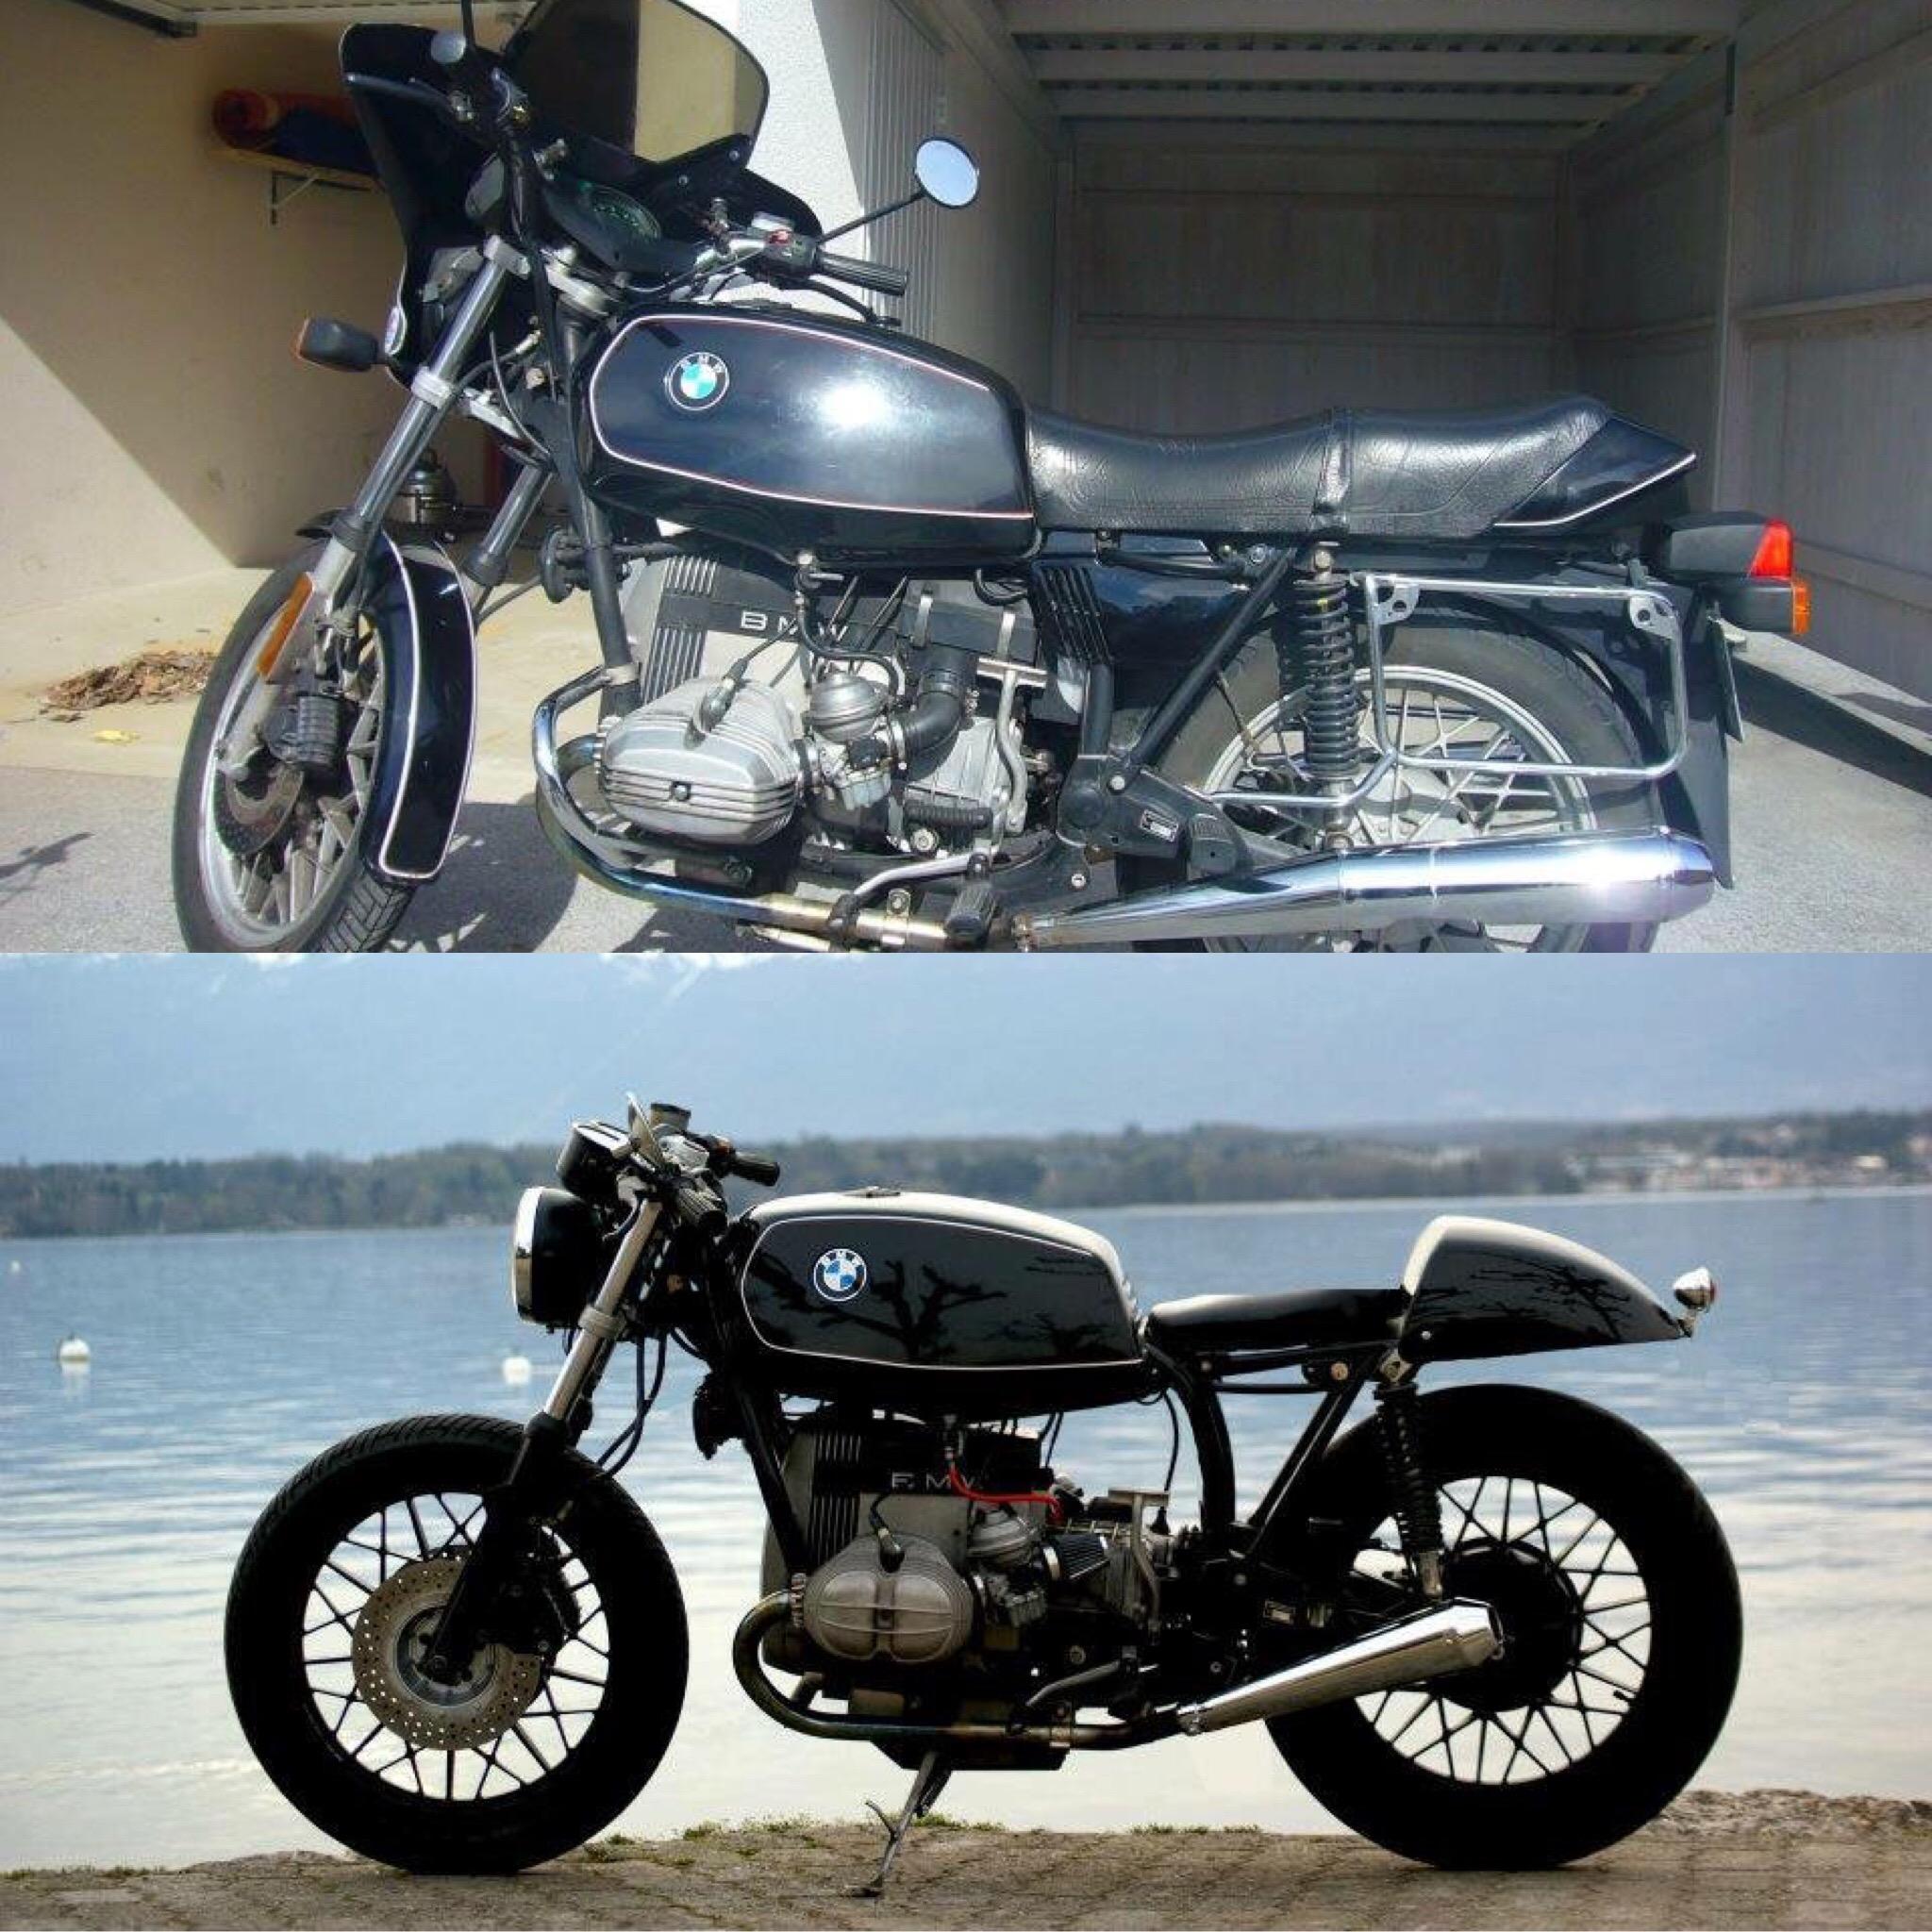 Copy of BMW R 65